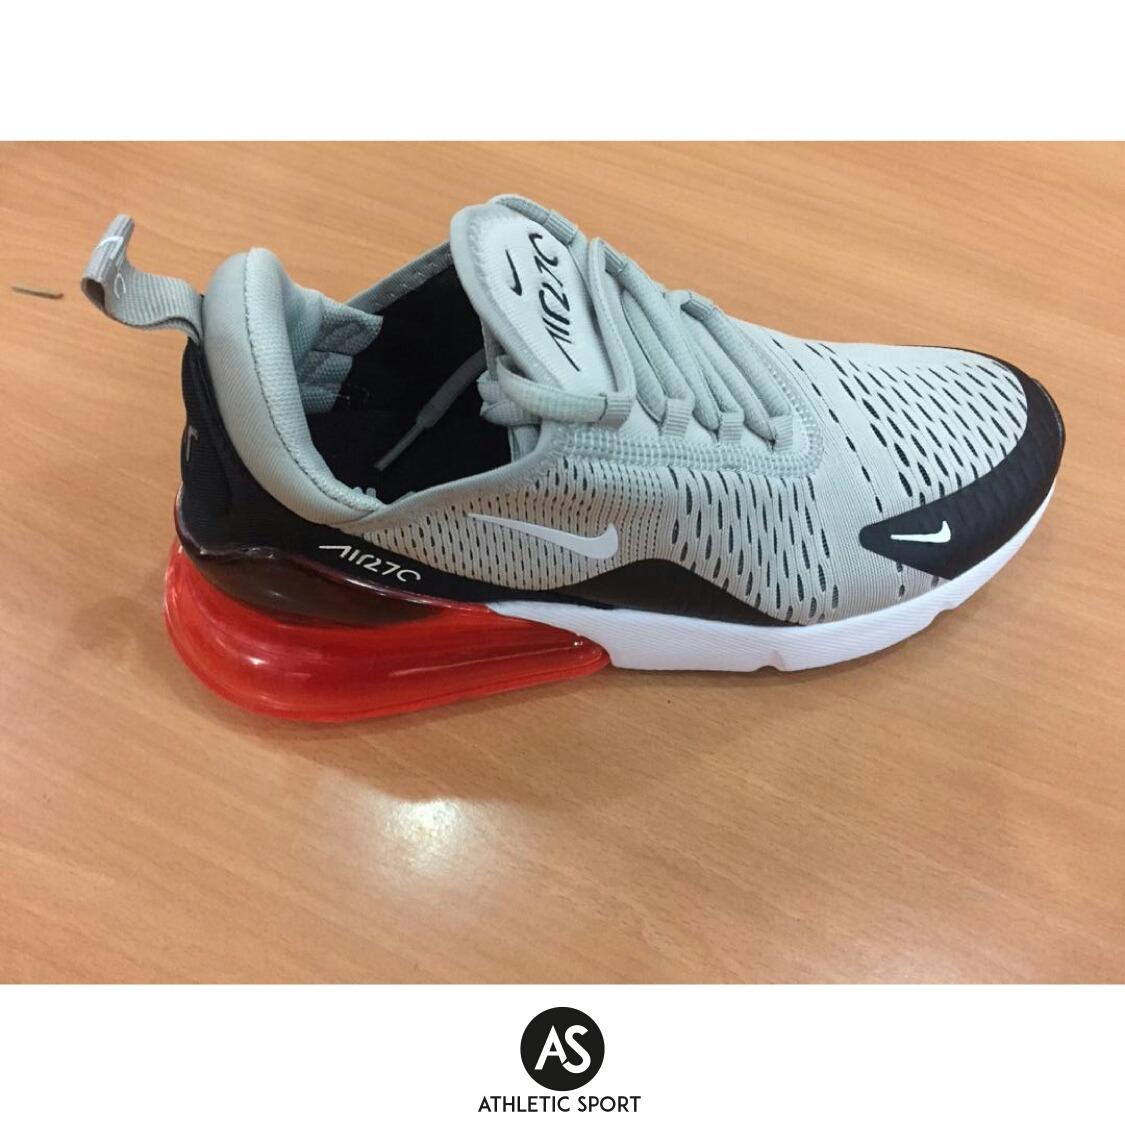 Caballeros Deportivos Max Nike 270 Air Zapatos 3qjSc5AL4R